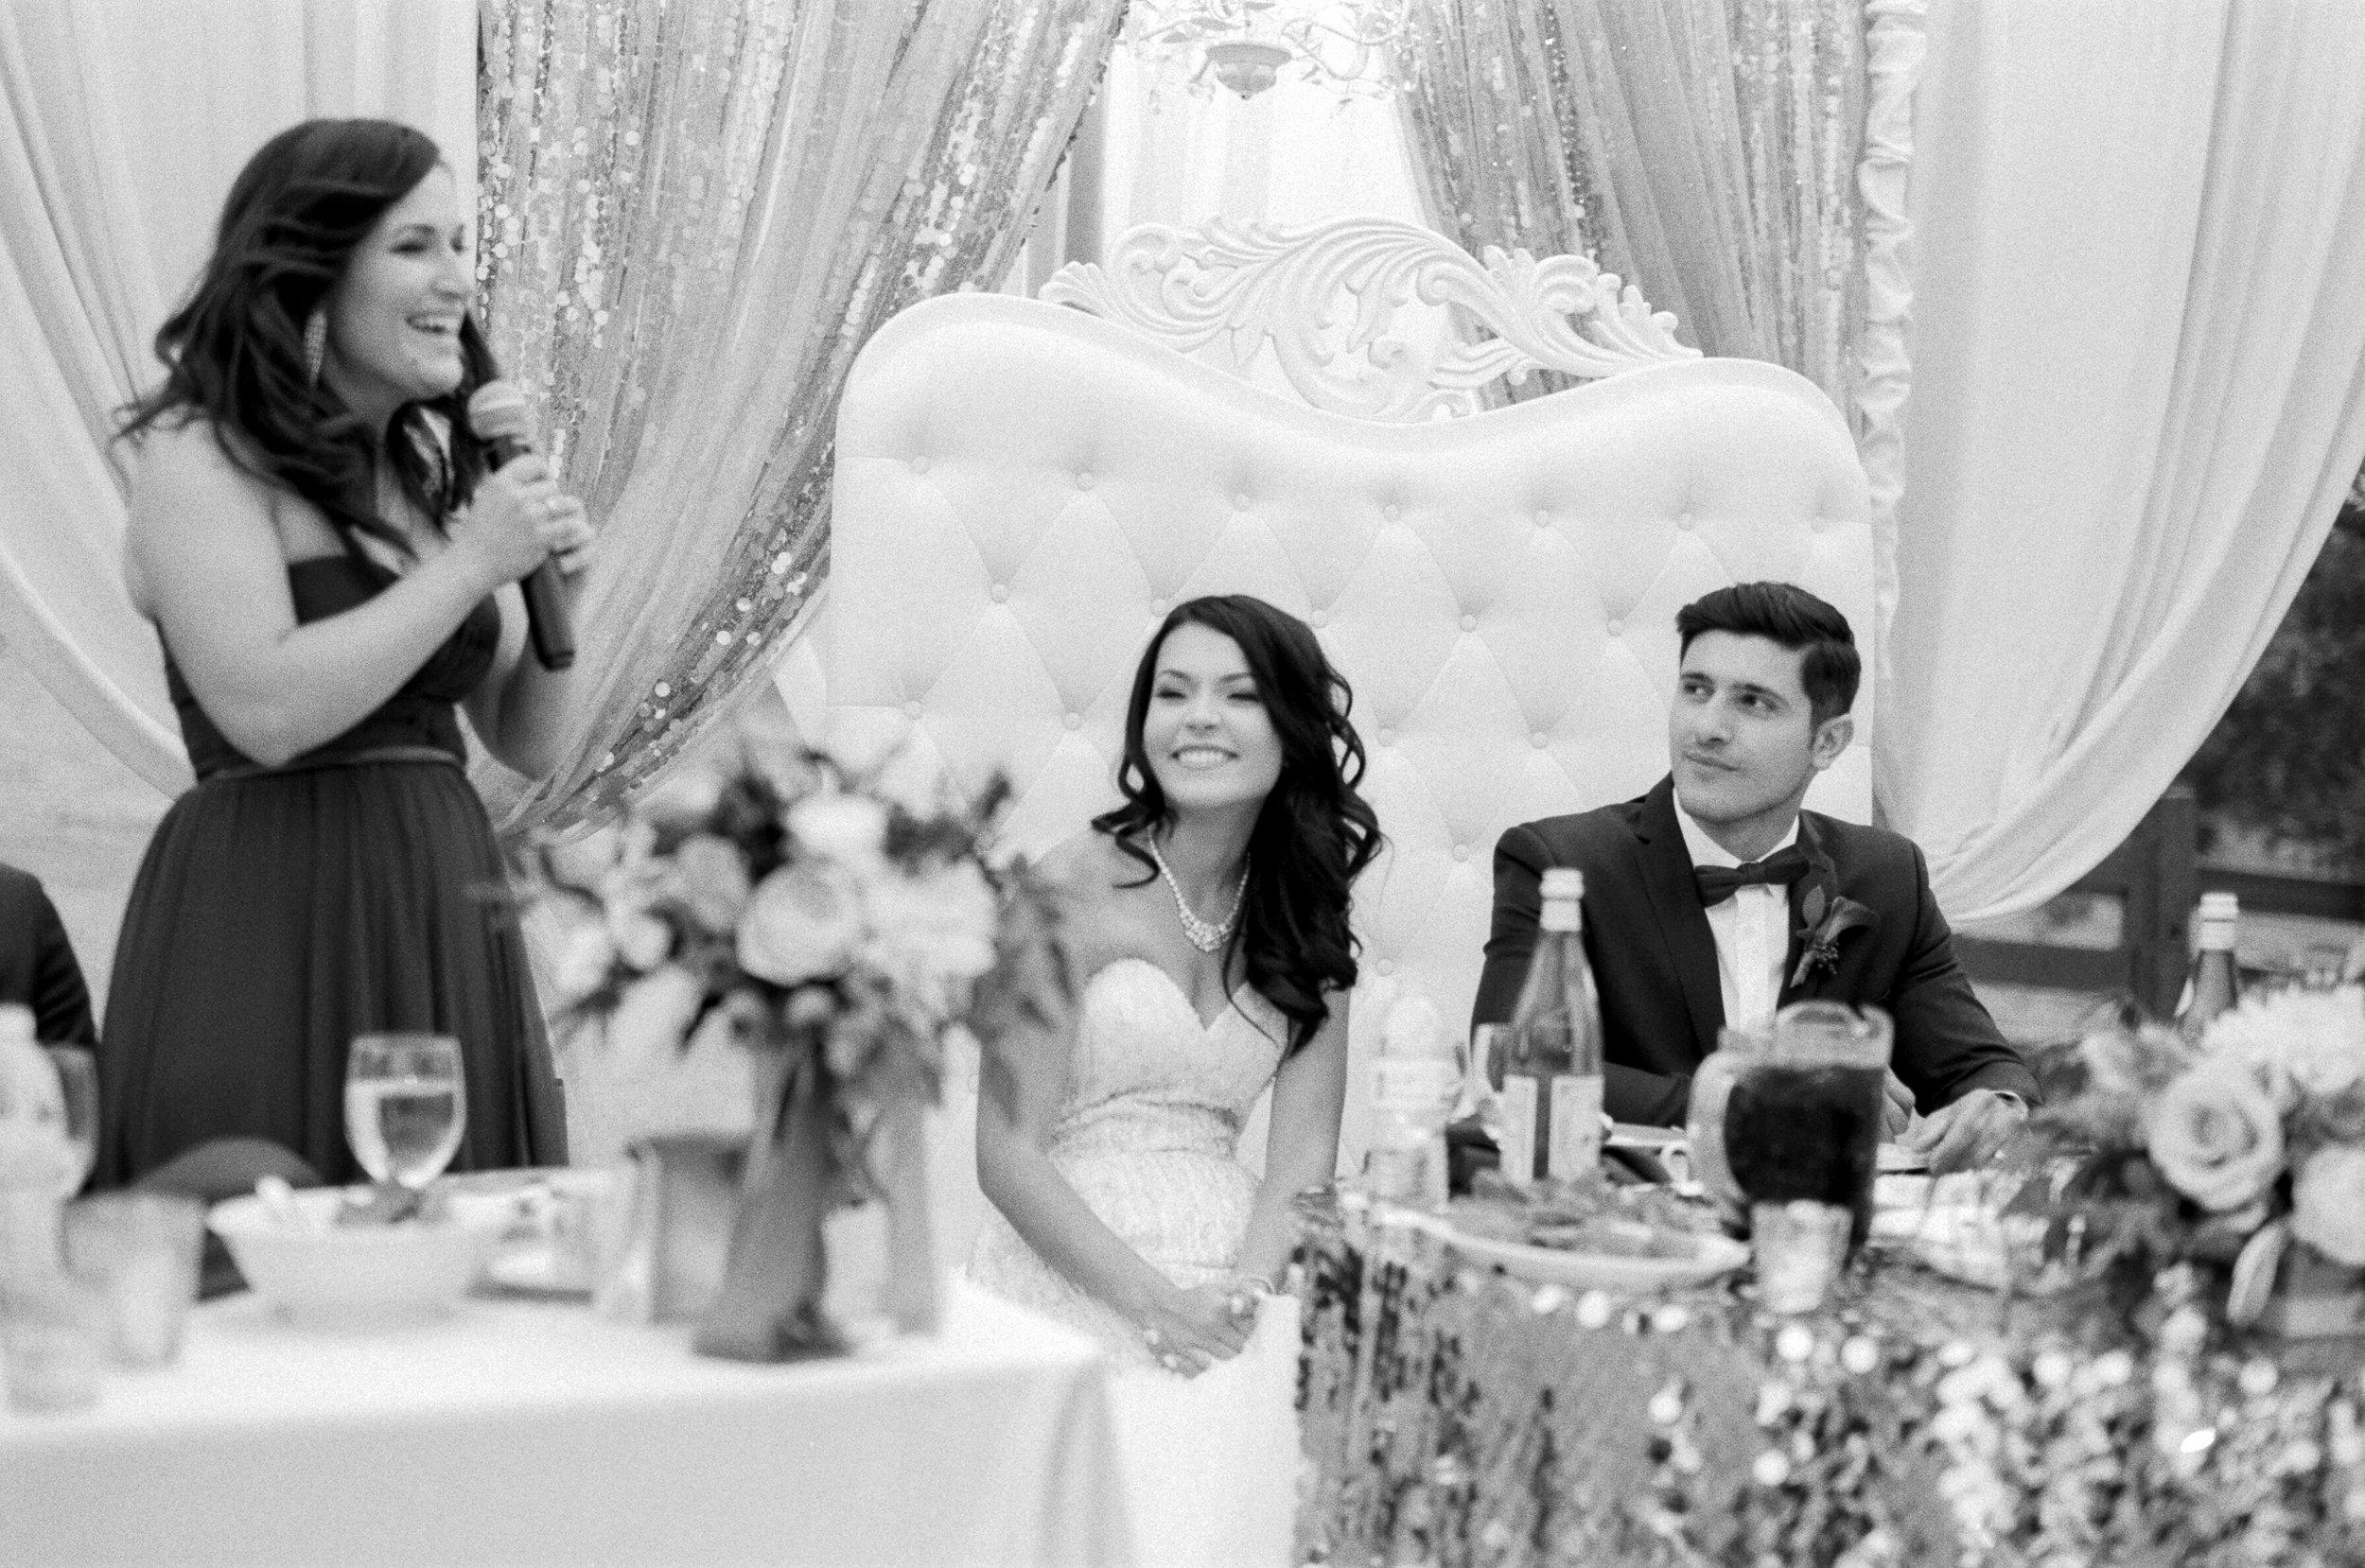 Amador_County_Wedding_Reception_Bride_Groom_Chair_Black_White_Rancho_Victoria_Vineyard_Northern_California.jpg